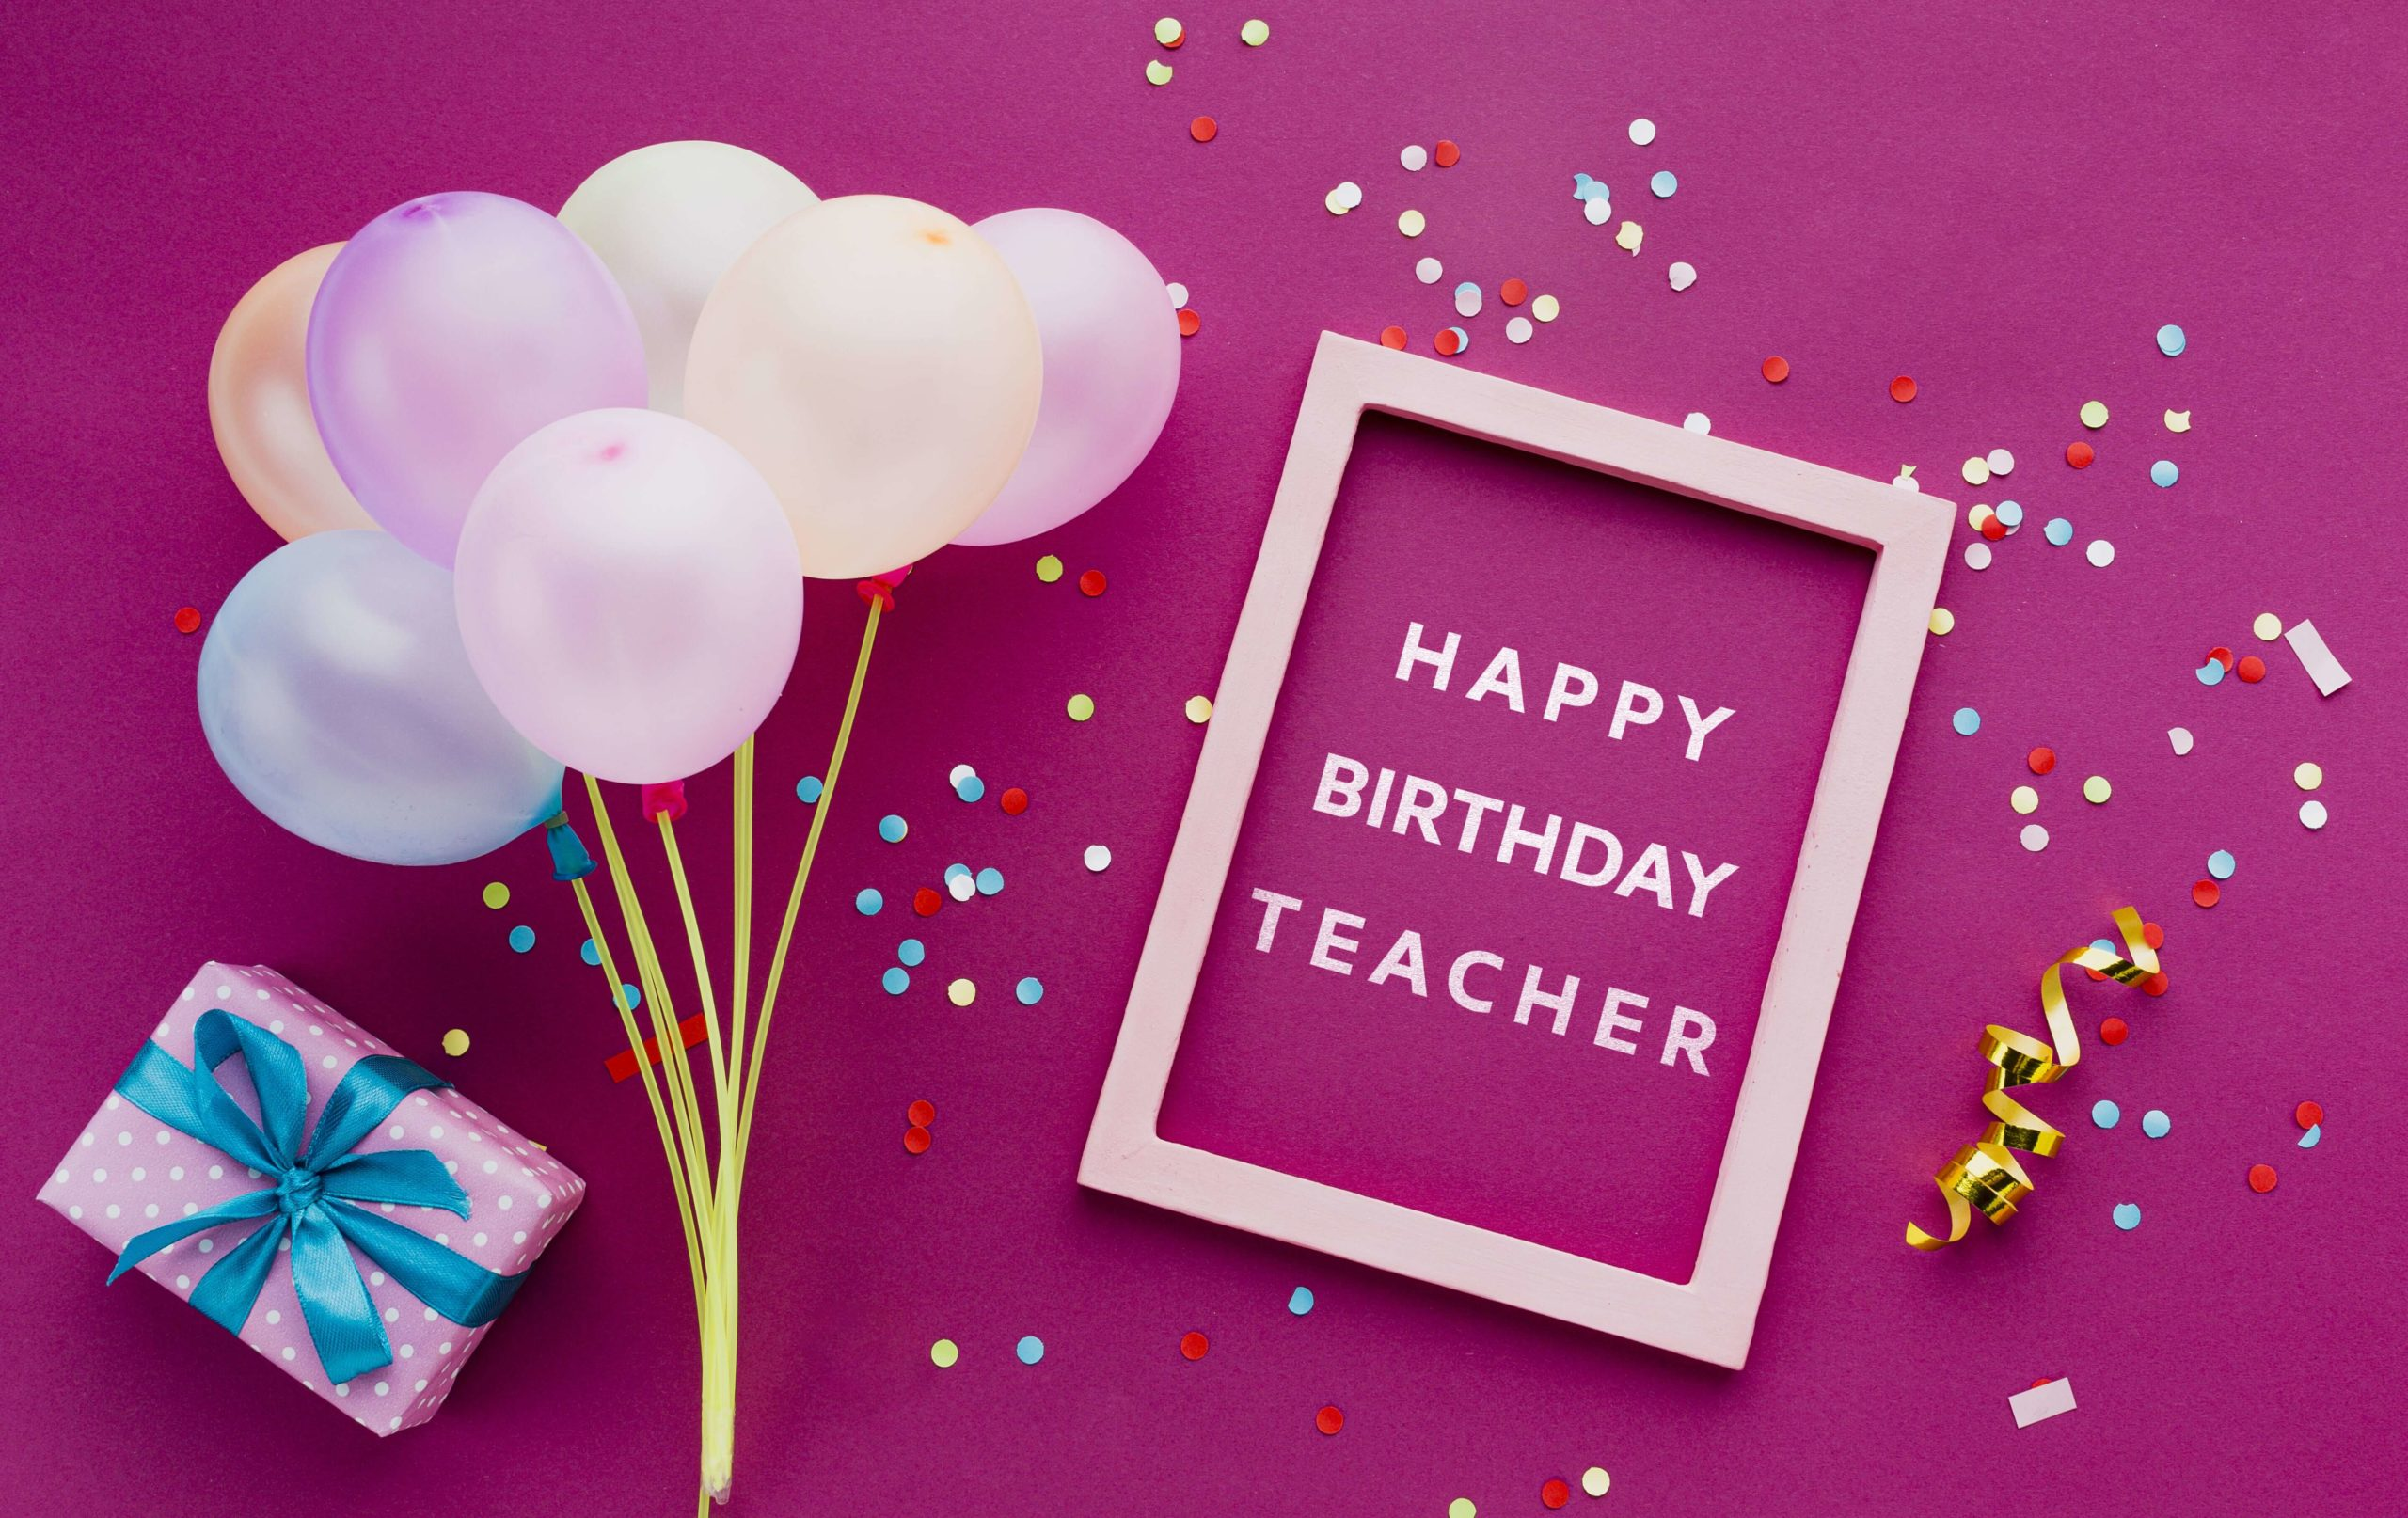 Happy Birthday Wishes For Teacher Best Birthday Wishes 2020